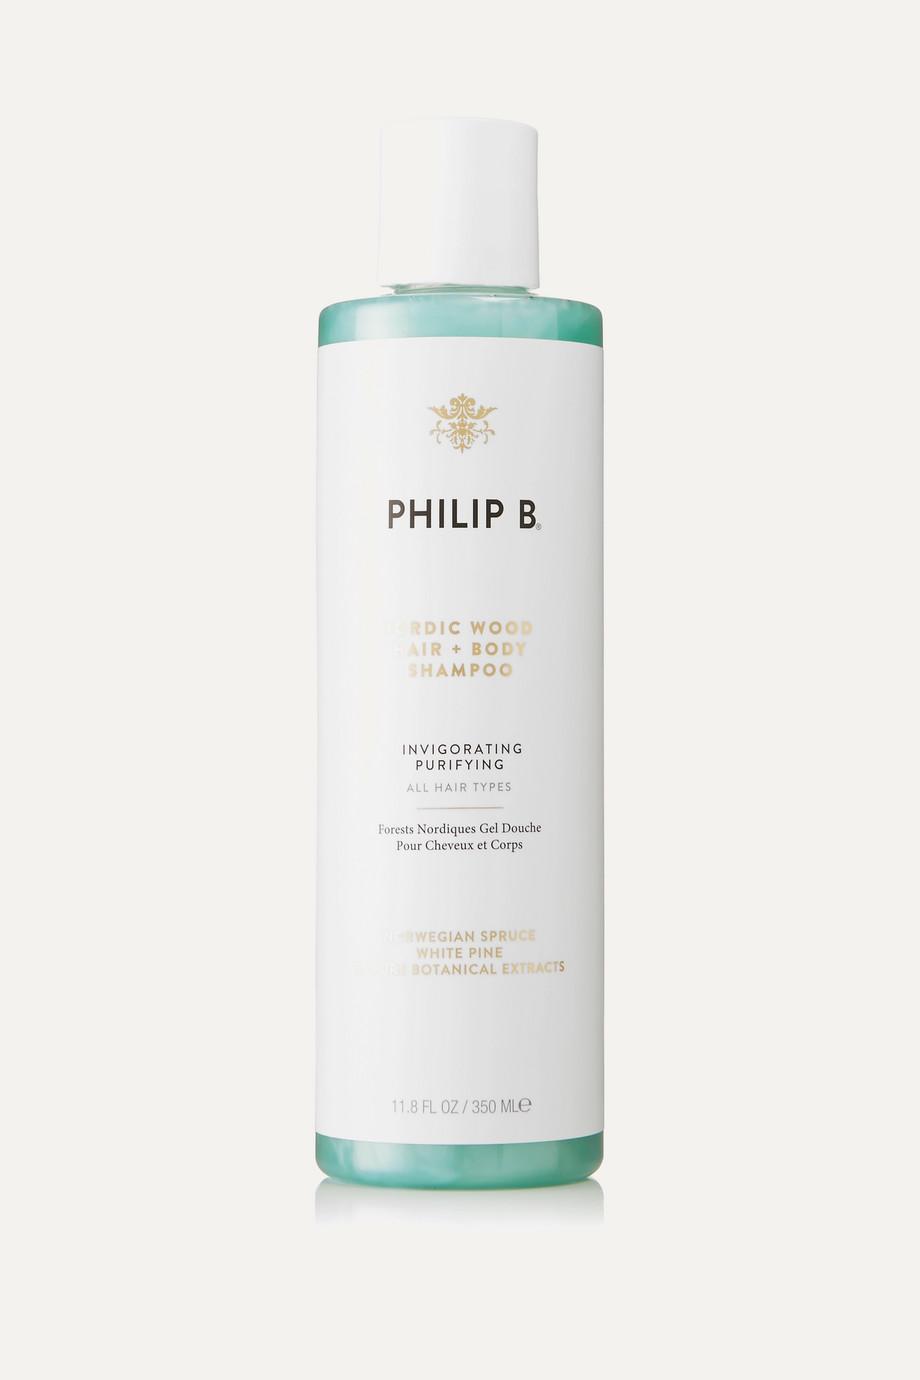 Philip B Nordic Wood Hair + Body Shampoo, 350ml